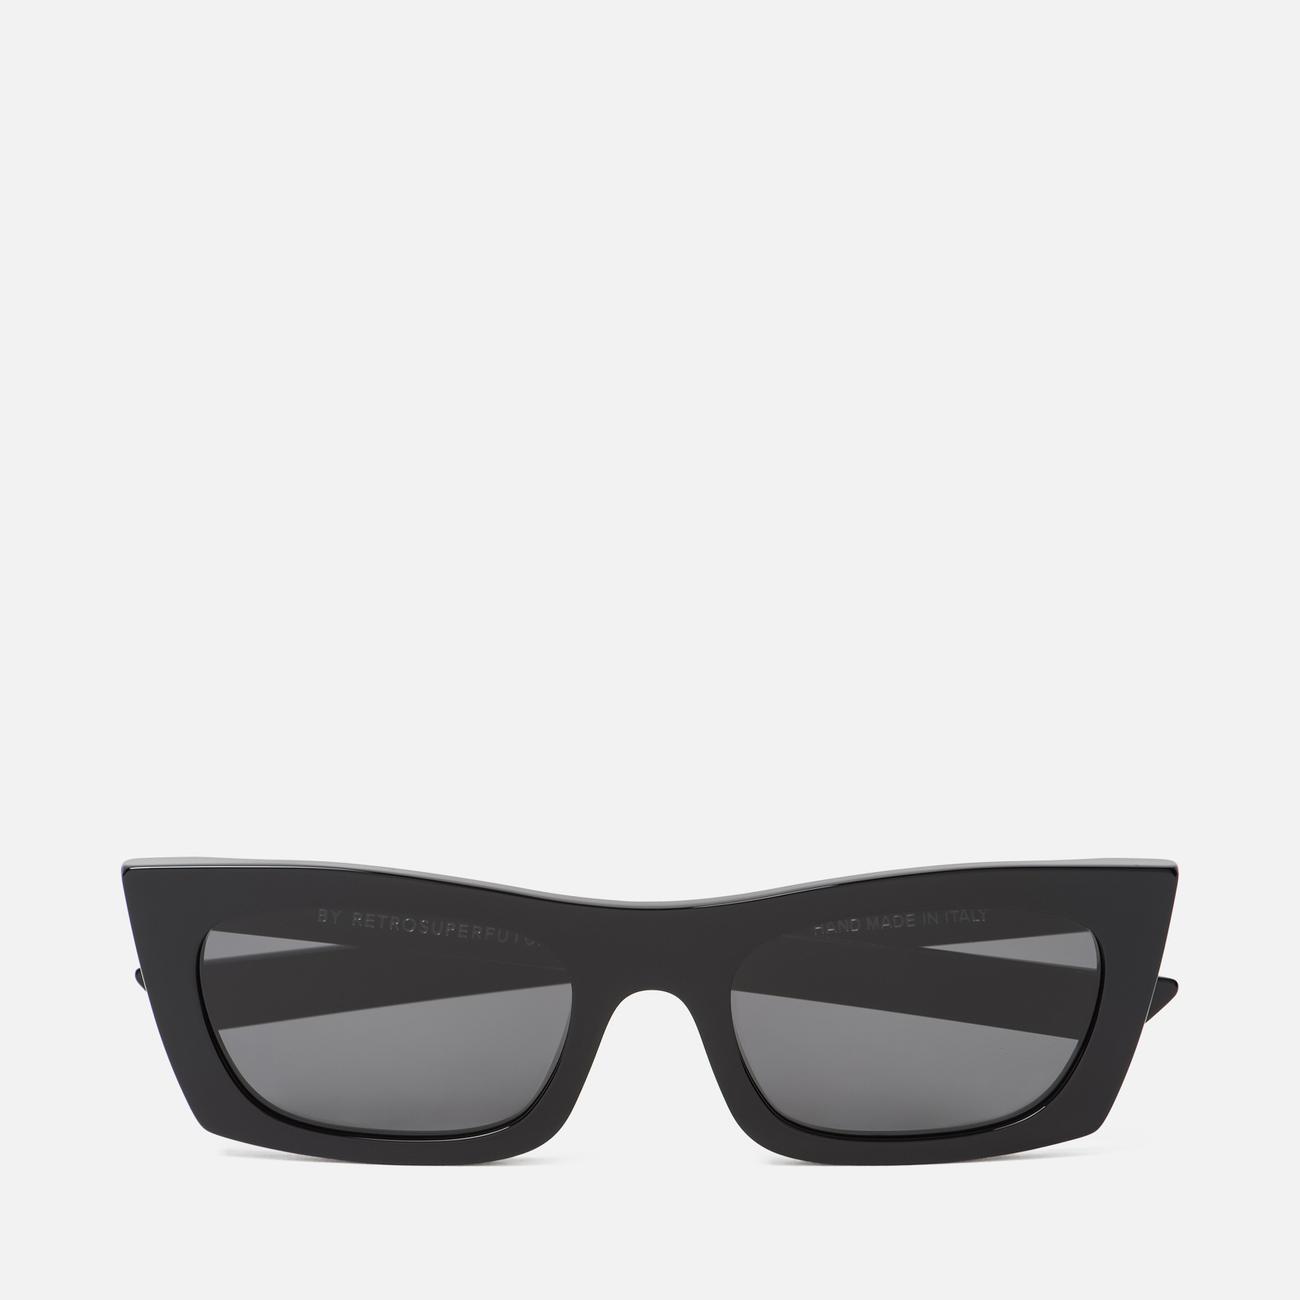 Солнцезащитные очки RETROSUPERFUTURE Fred 53 Black